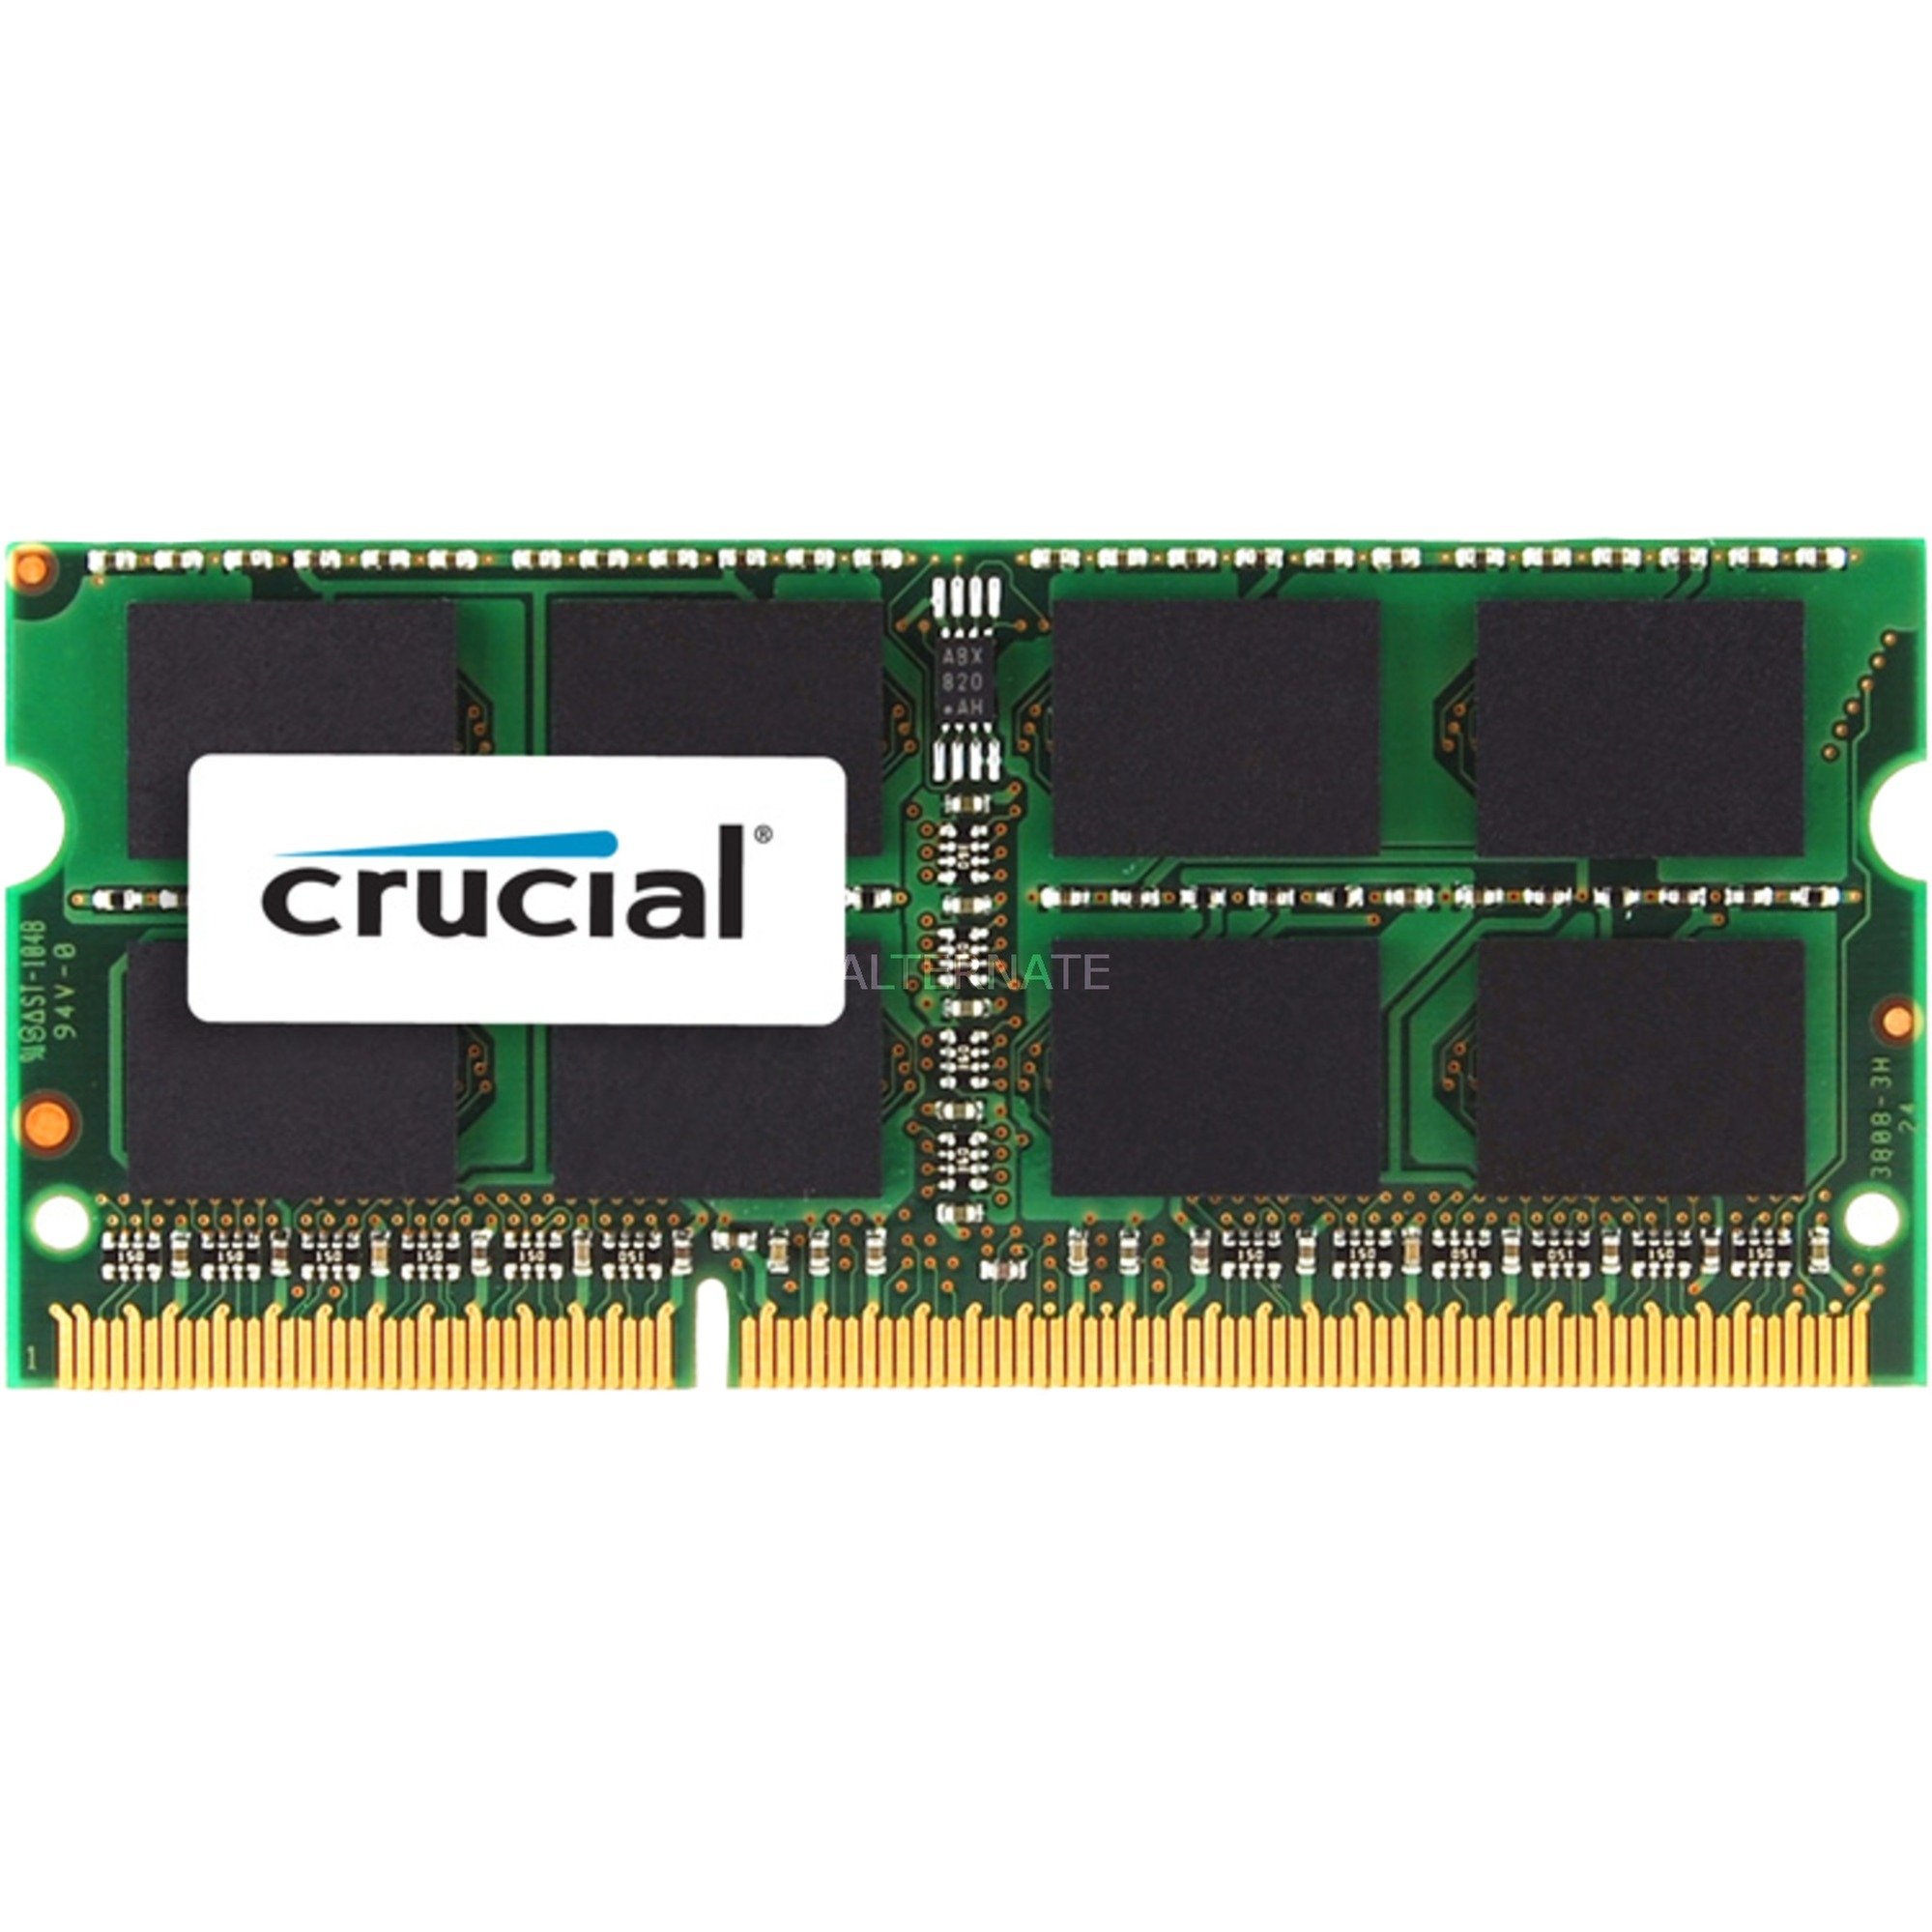 16GB (2x8GB) DDR3-1333 CL9 SO-DIMM 16GB DDR3 1333MHz módulo de memoria, Memoria RAM